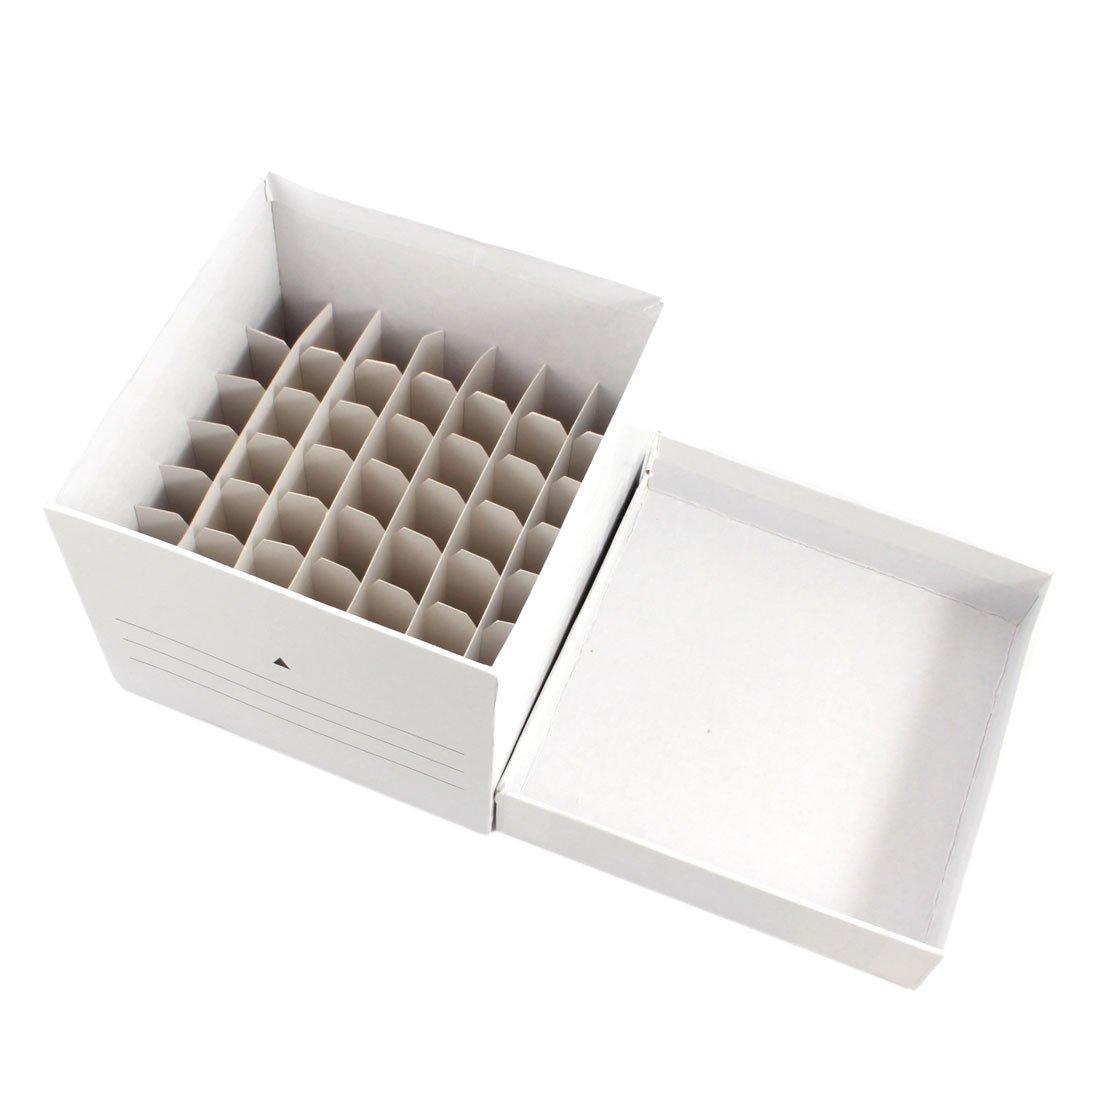 Lab 10ml-15ml Storage Paper Cube 49 Positions Centrifuge Tube Box